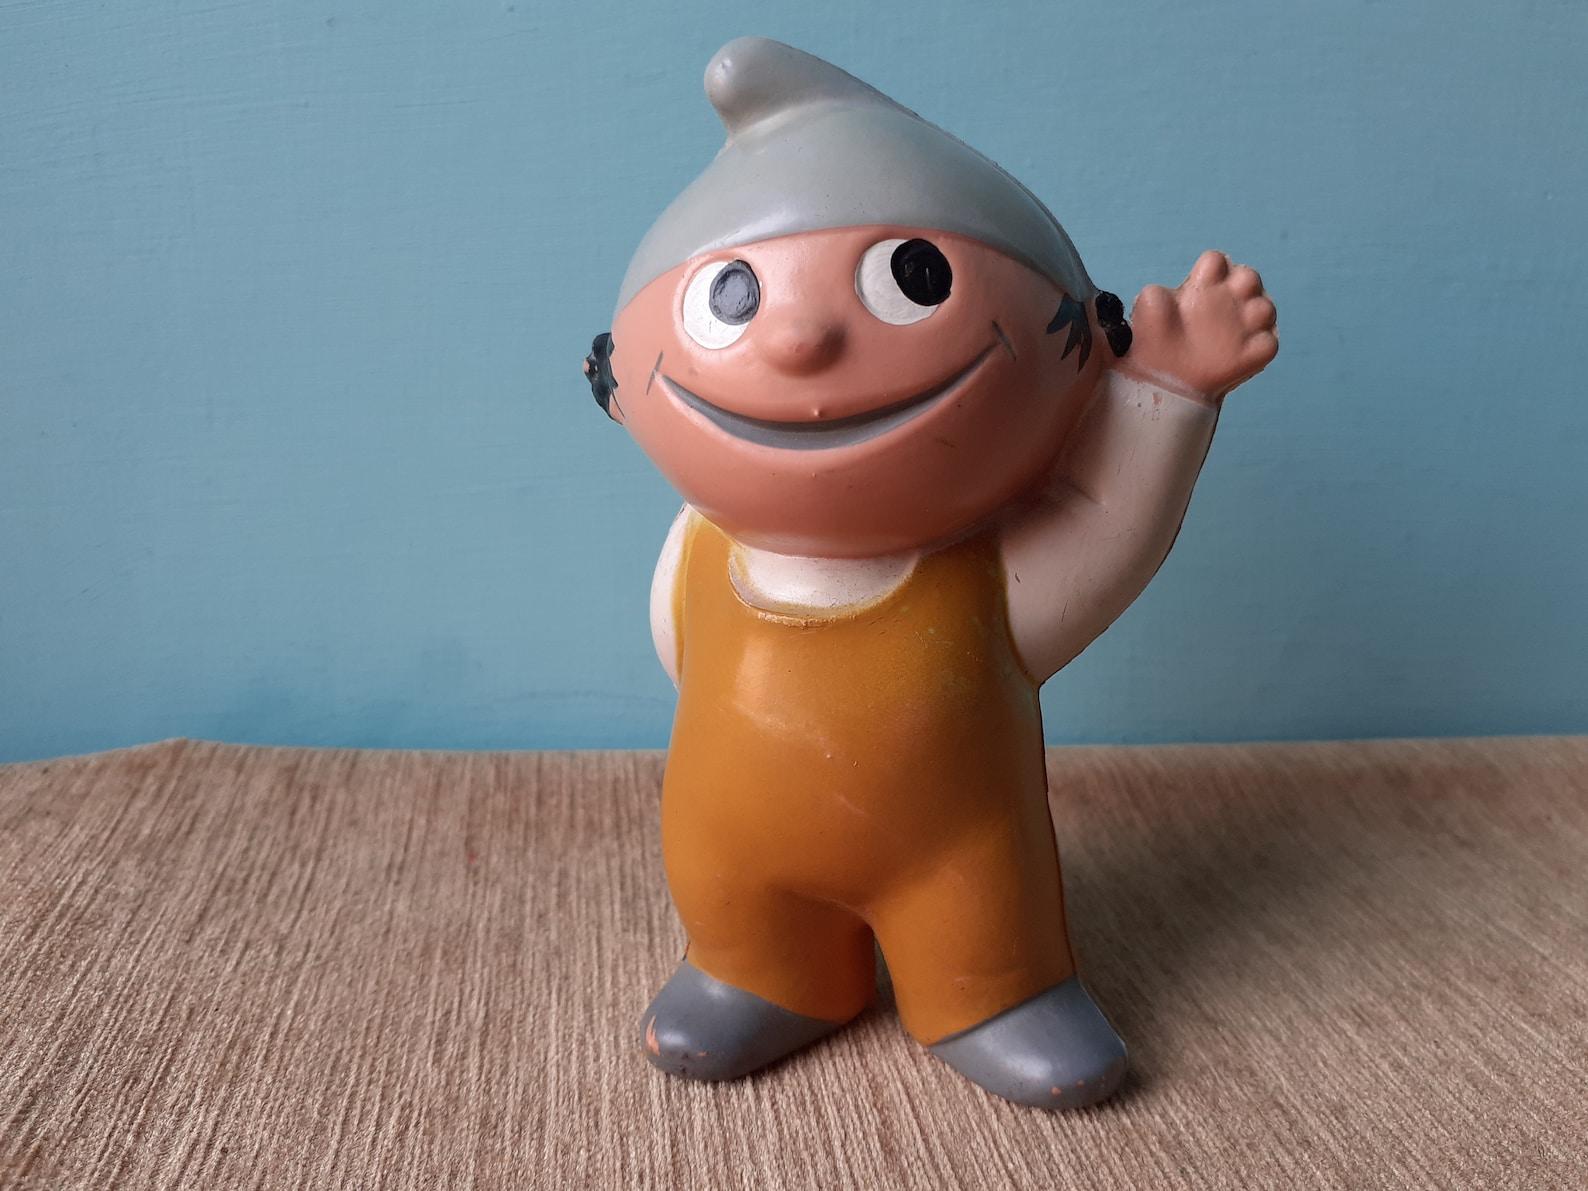 Goebel Hummel ZDF Mainzelmännchen Conni Rubber Plastic Waving Toy in Overalls German Cartoon 1960s